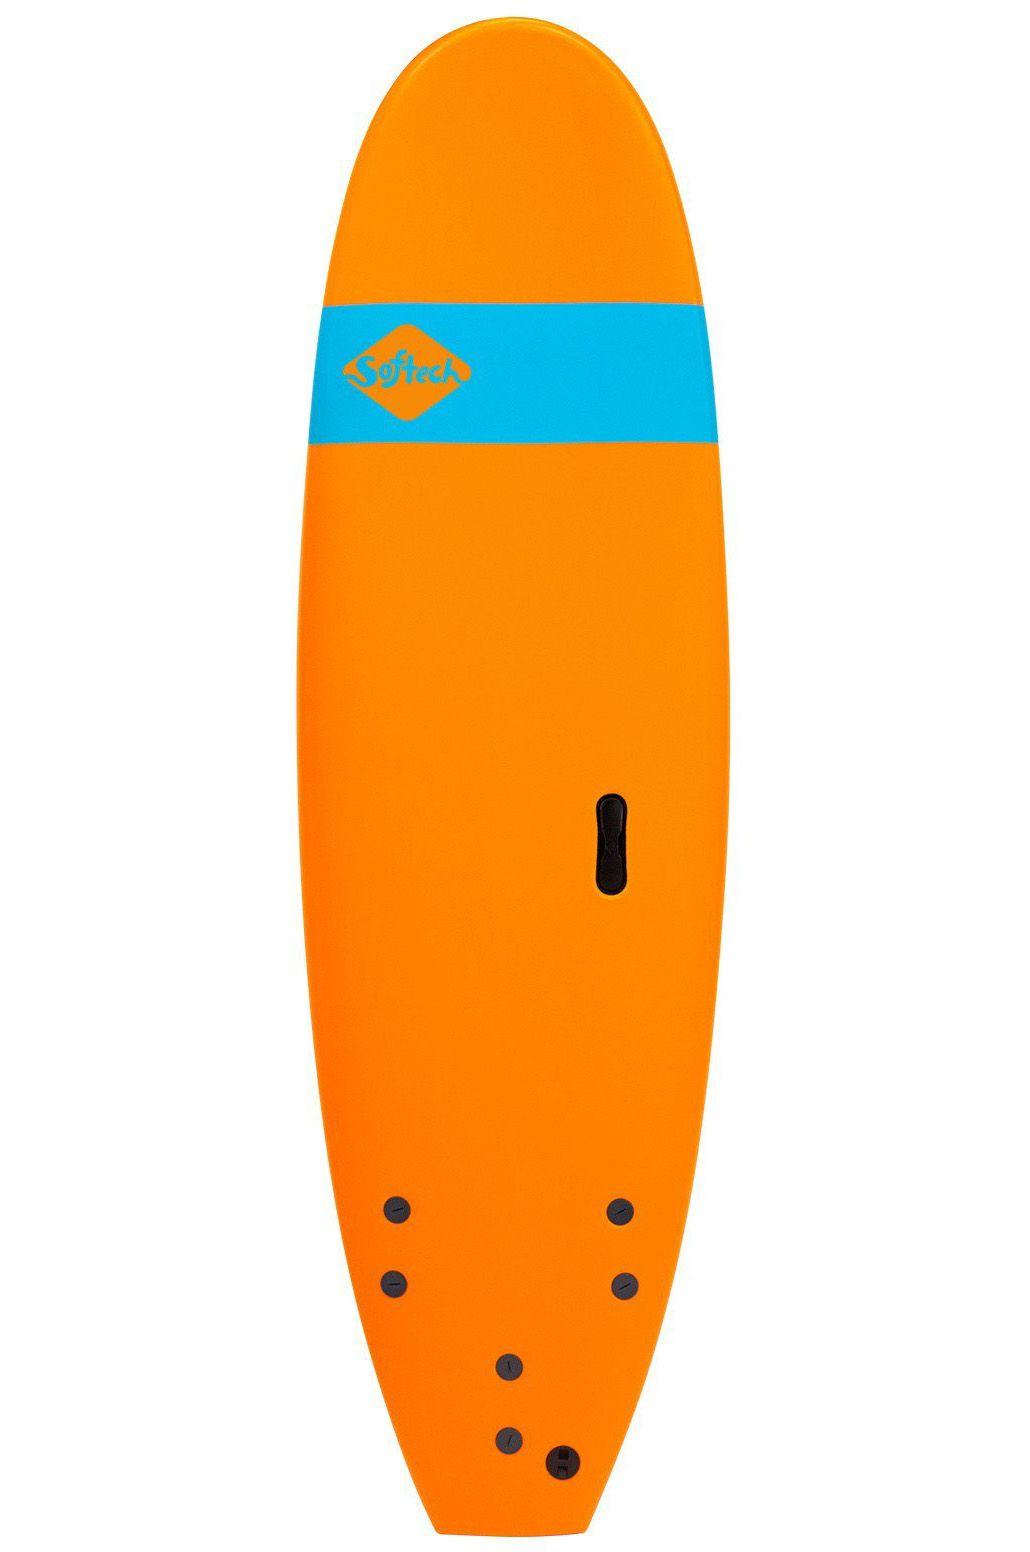 Prancha Surf Softech 8'0 ROLLER ORANGE Square Tail - Color FCS 8ft0